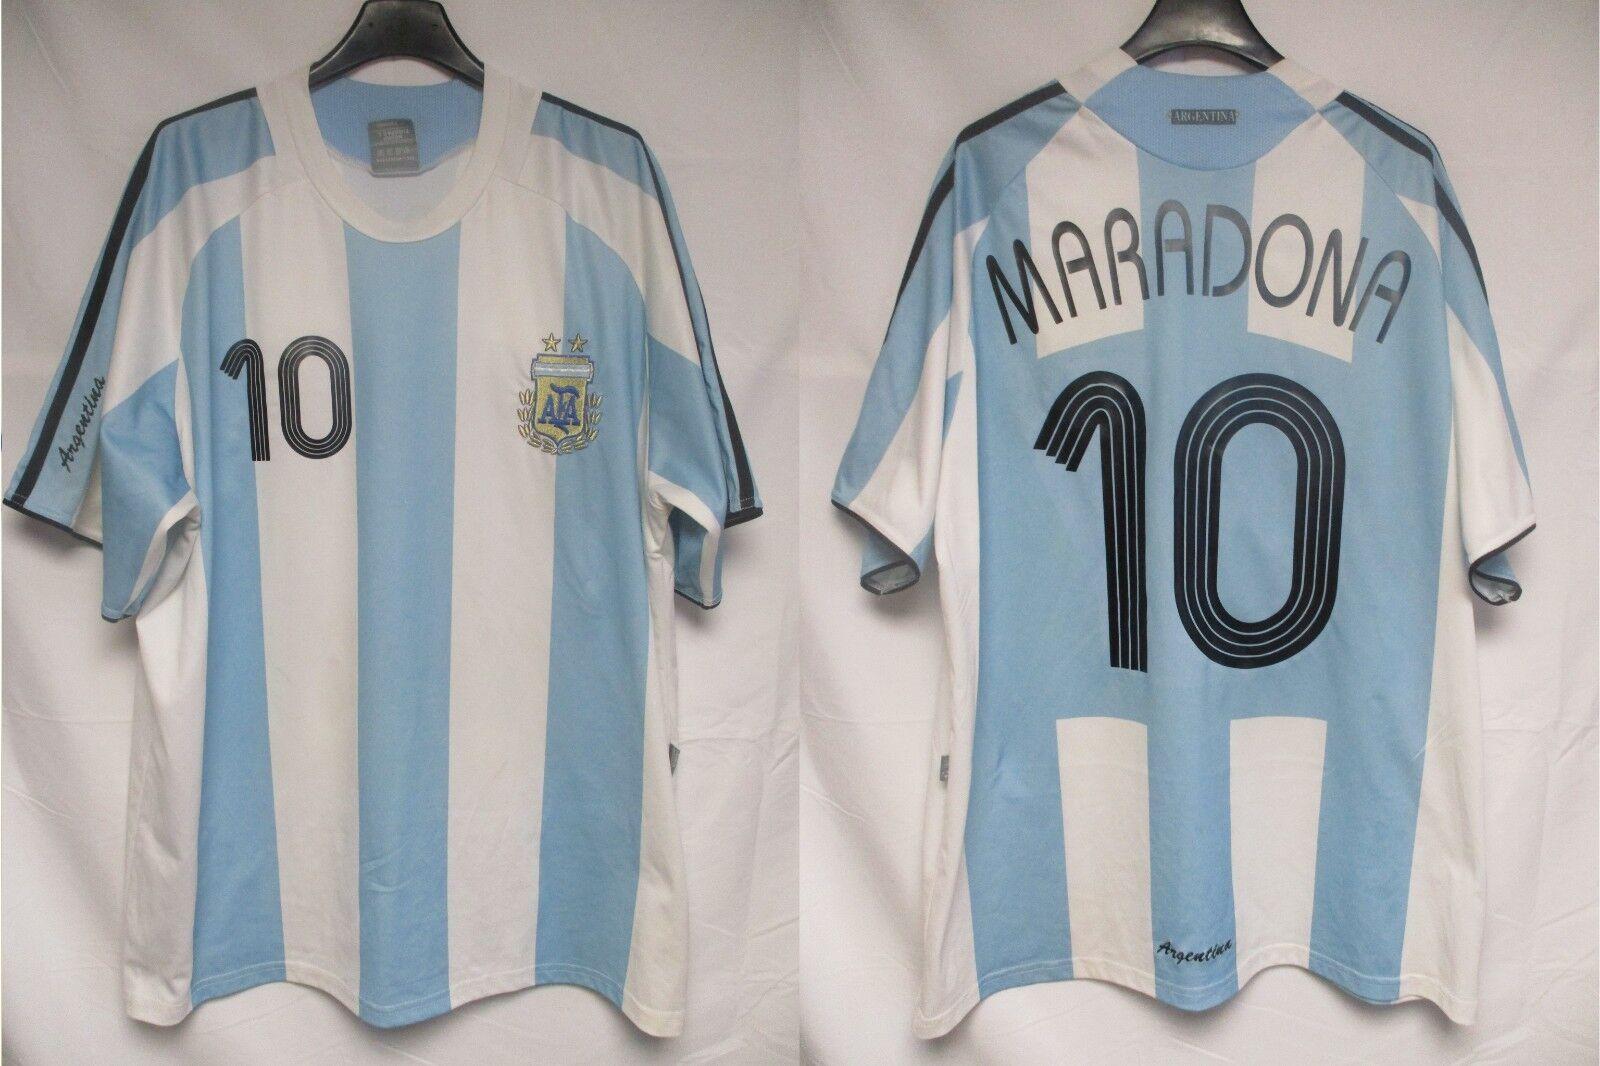 Maillot silverINE silverINA MARADONA vintage shirt trikot jersey camiseta XL